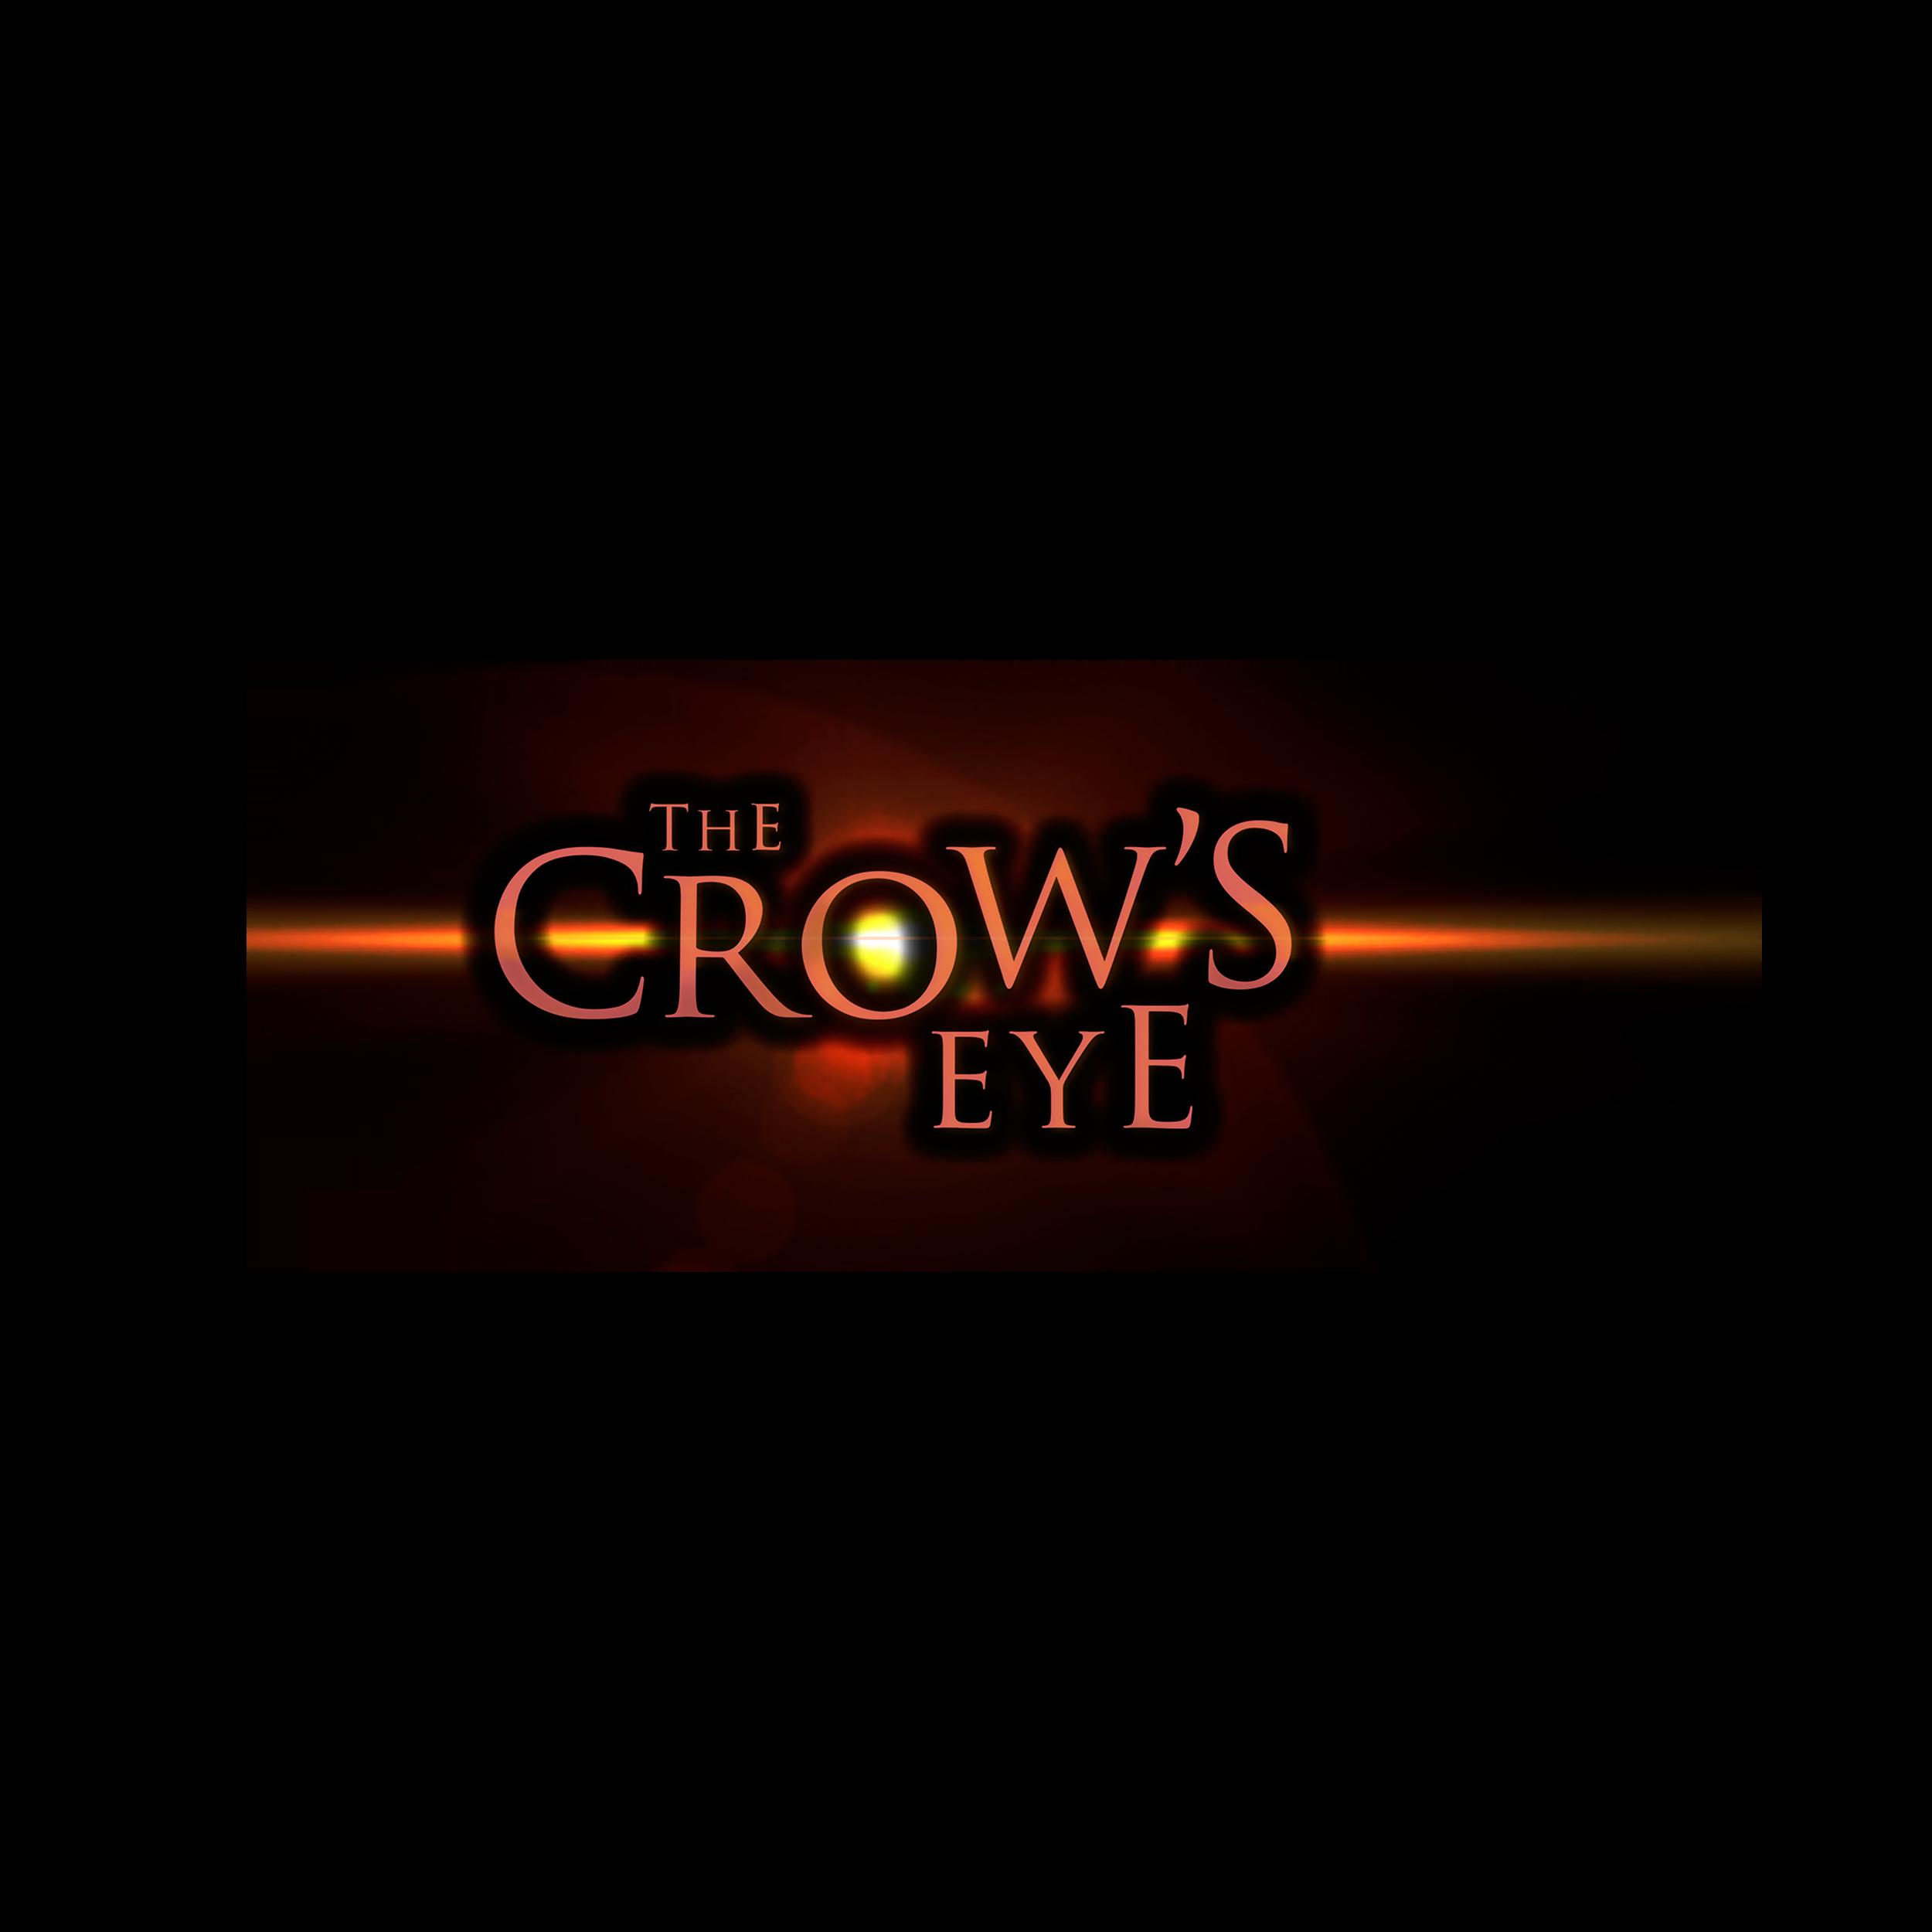 The Crow's Eye logo